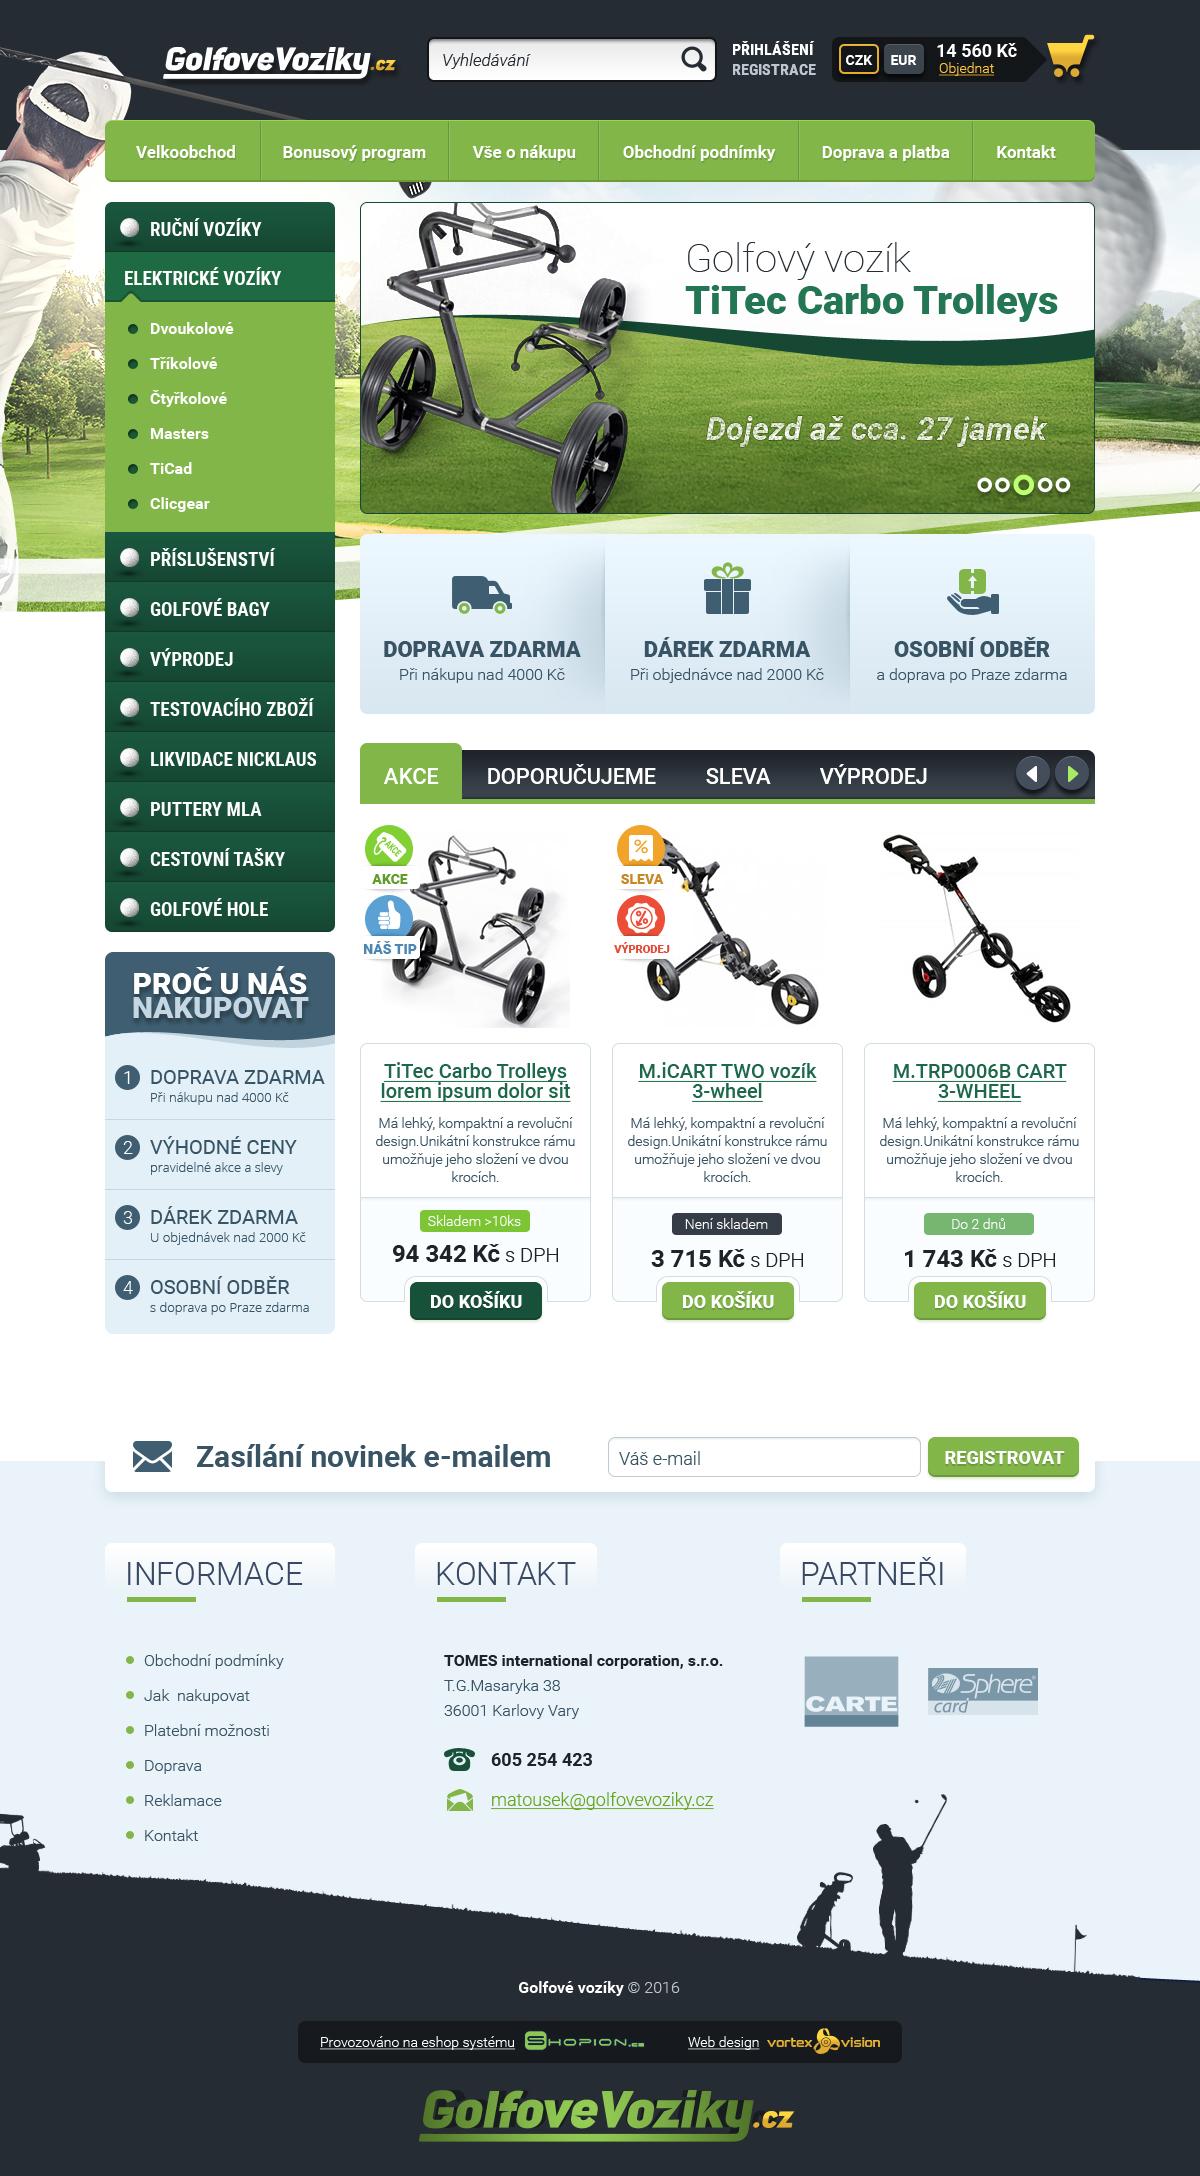 Internetový obchod .golfovevoziky.cz